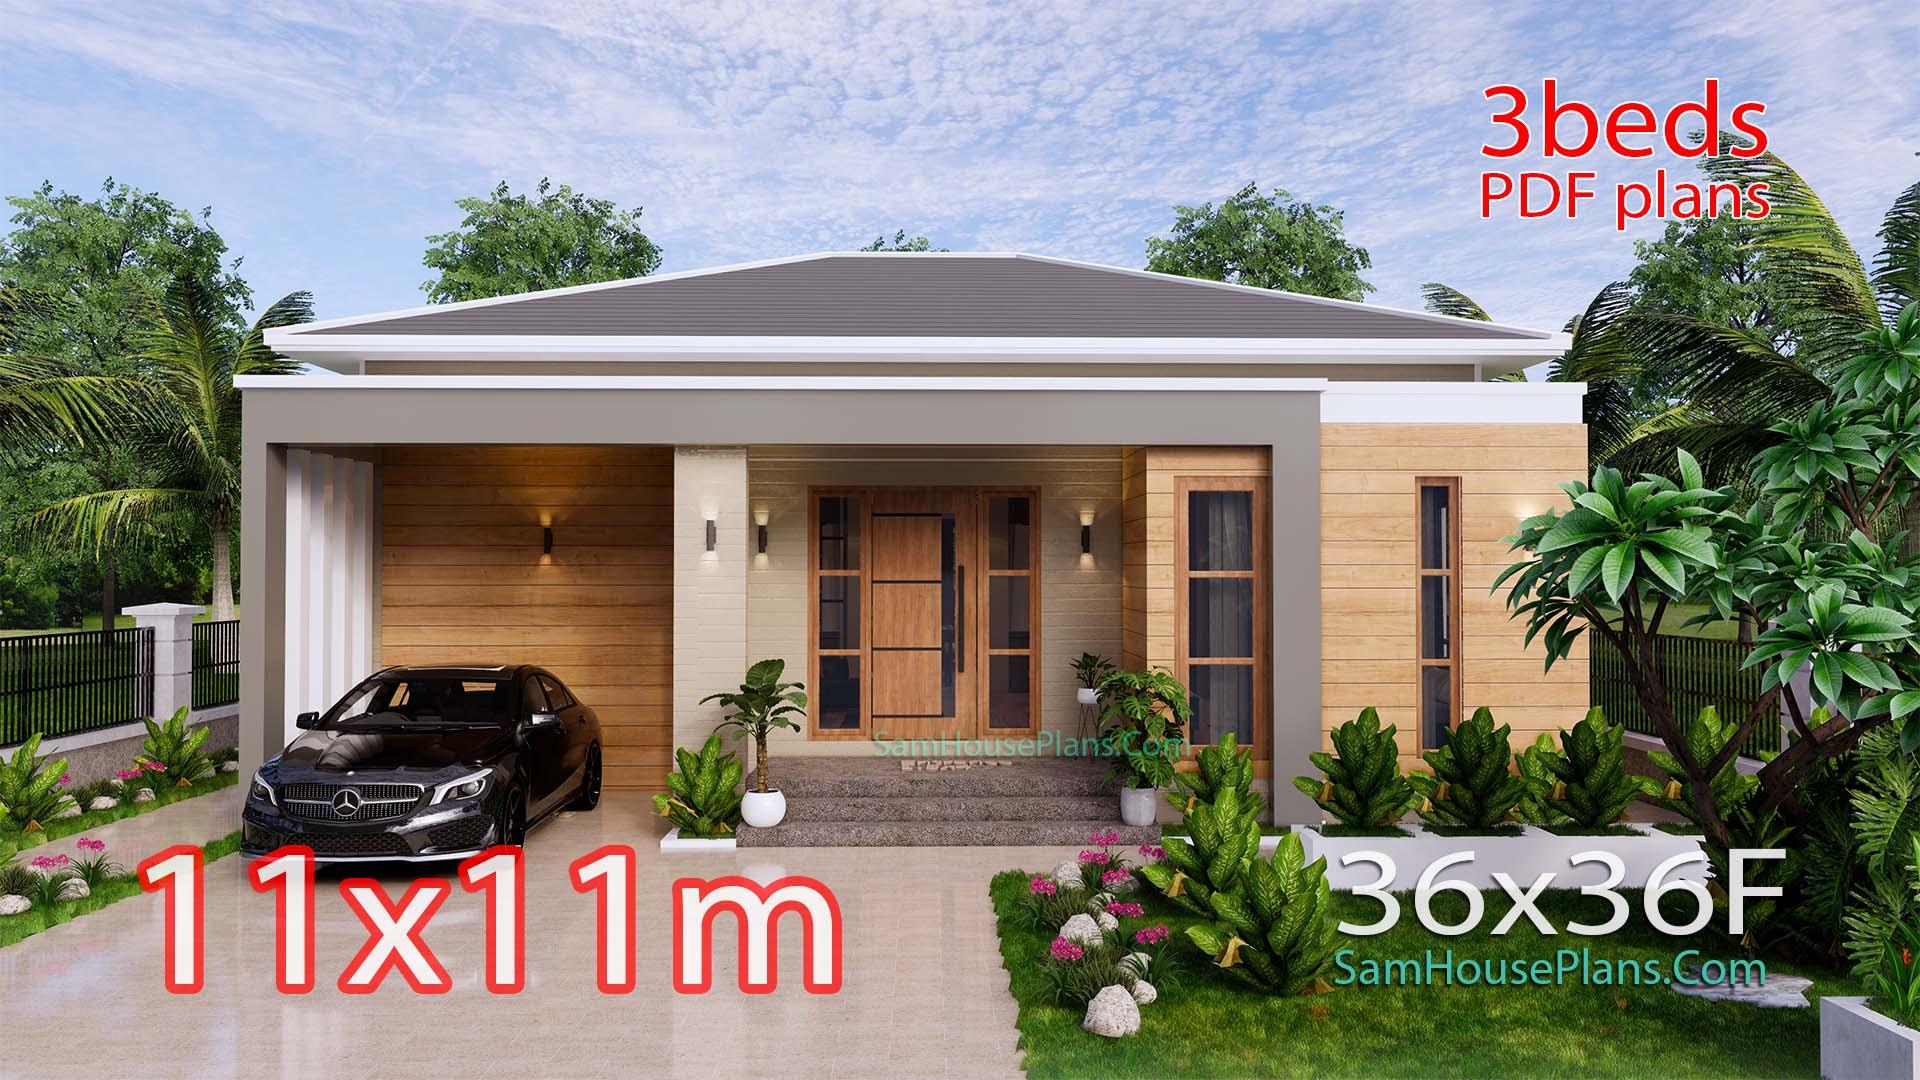 Modern House Plan 11x11 Meter 36x36 Feet 3 Beds PDF Plan